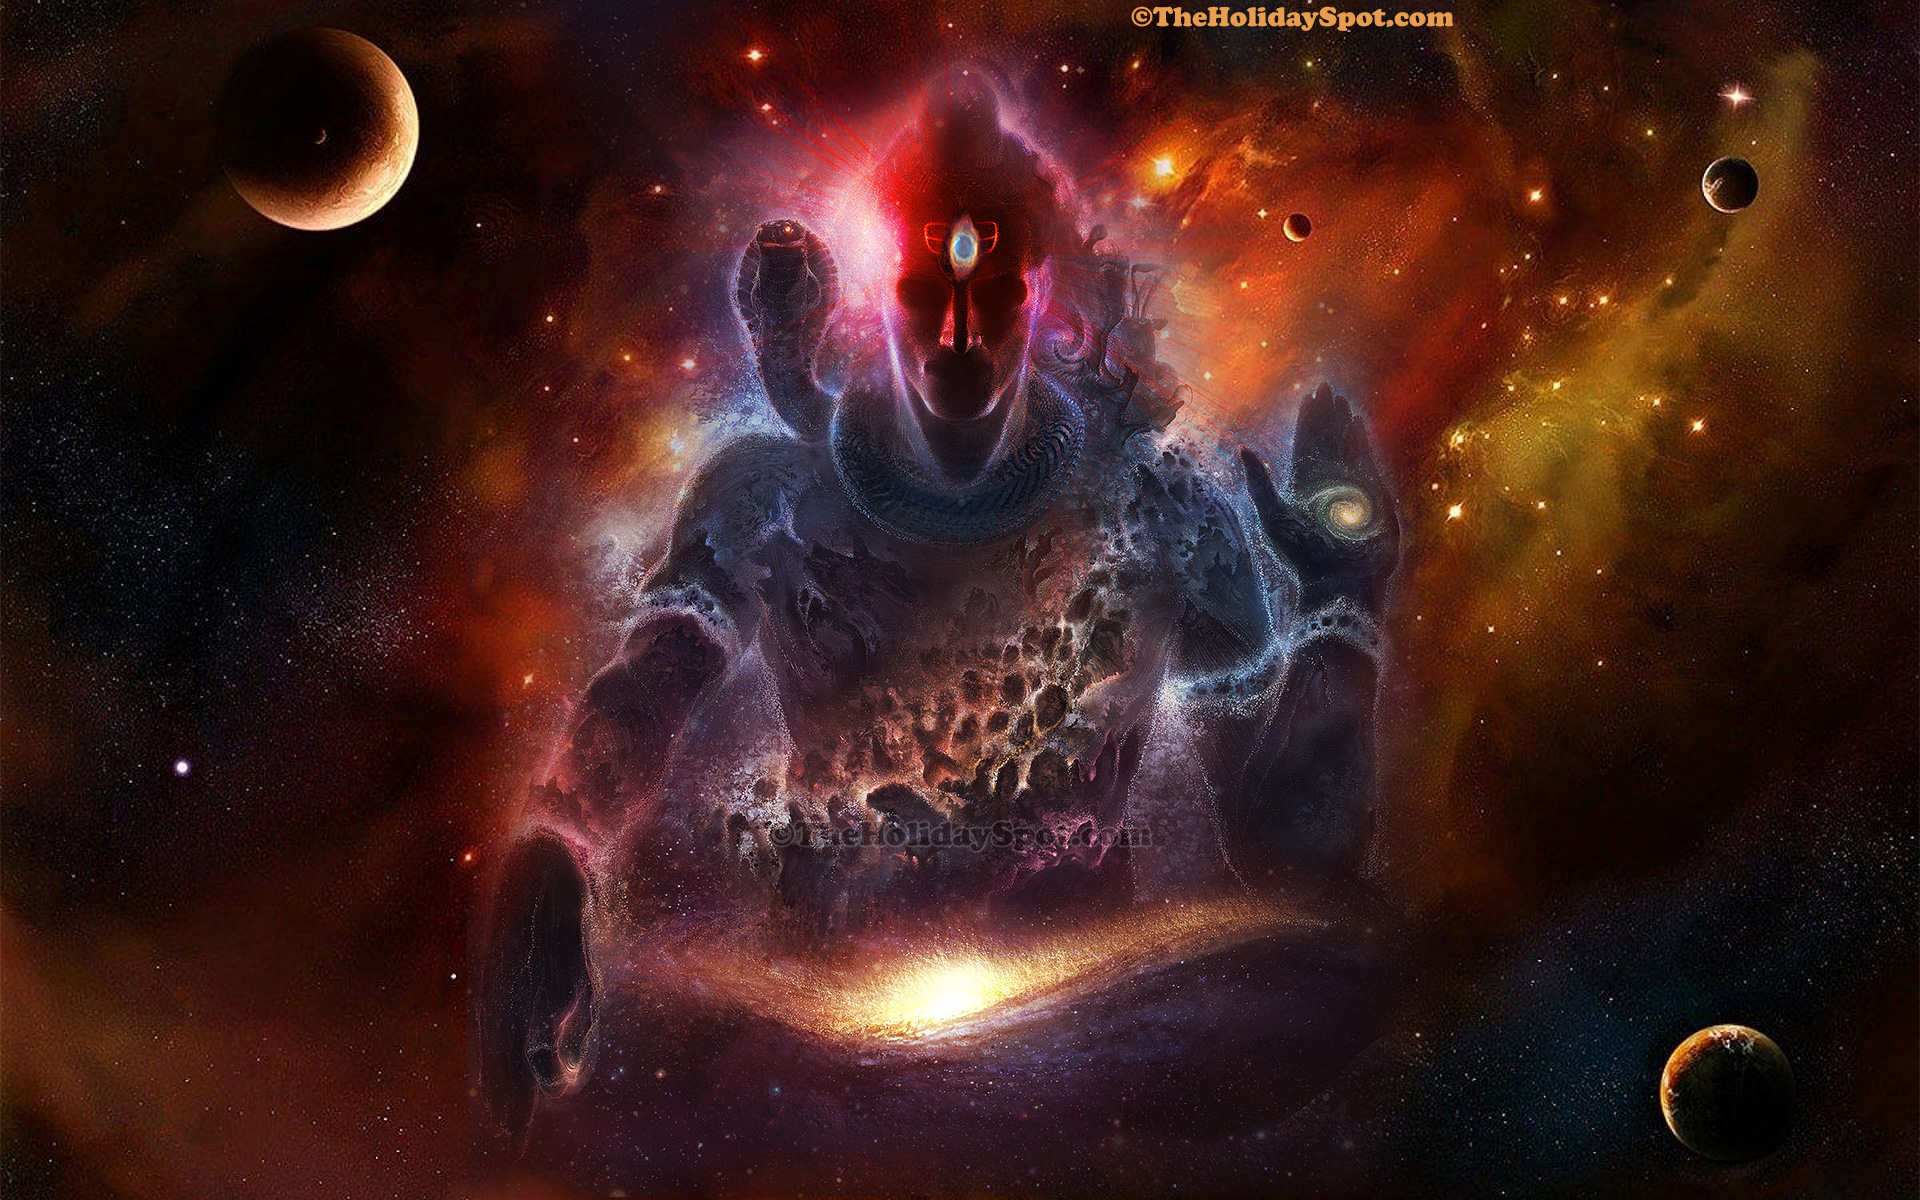 Lord shiva wallpapers hd wallpapersafari - Lord shiva images for desktop in hd ...